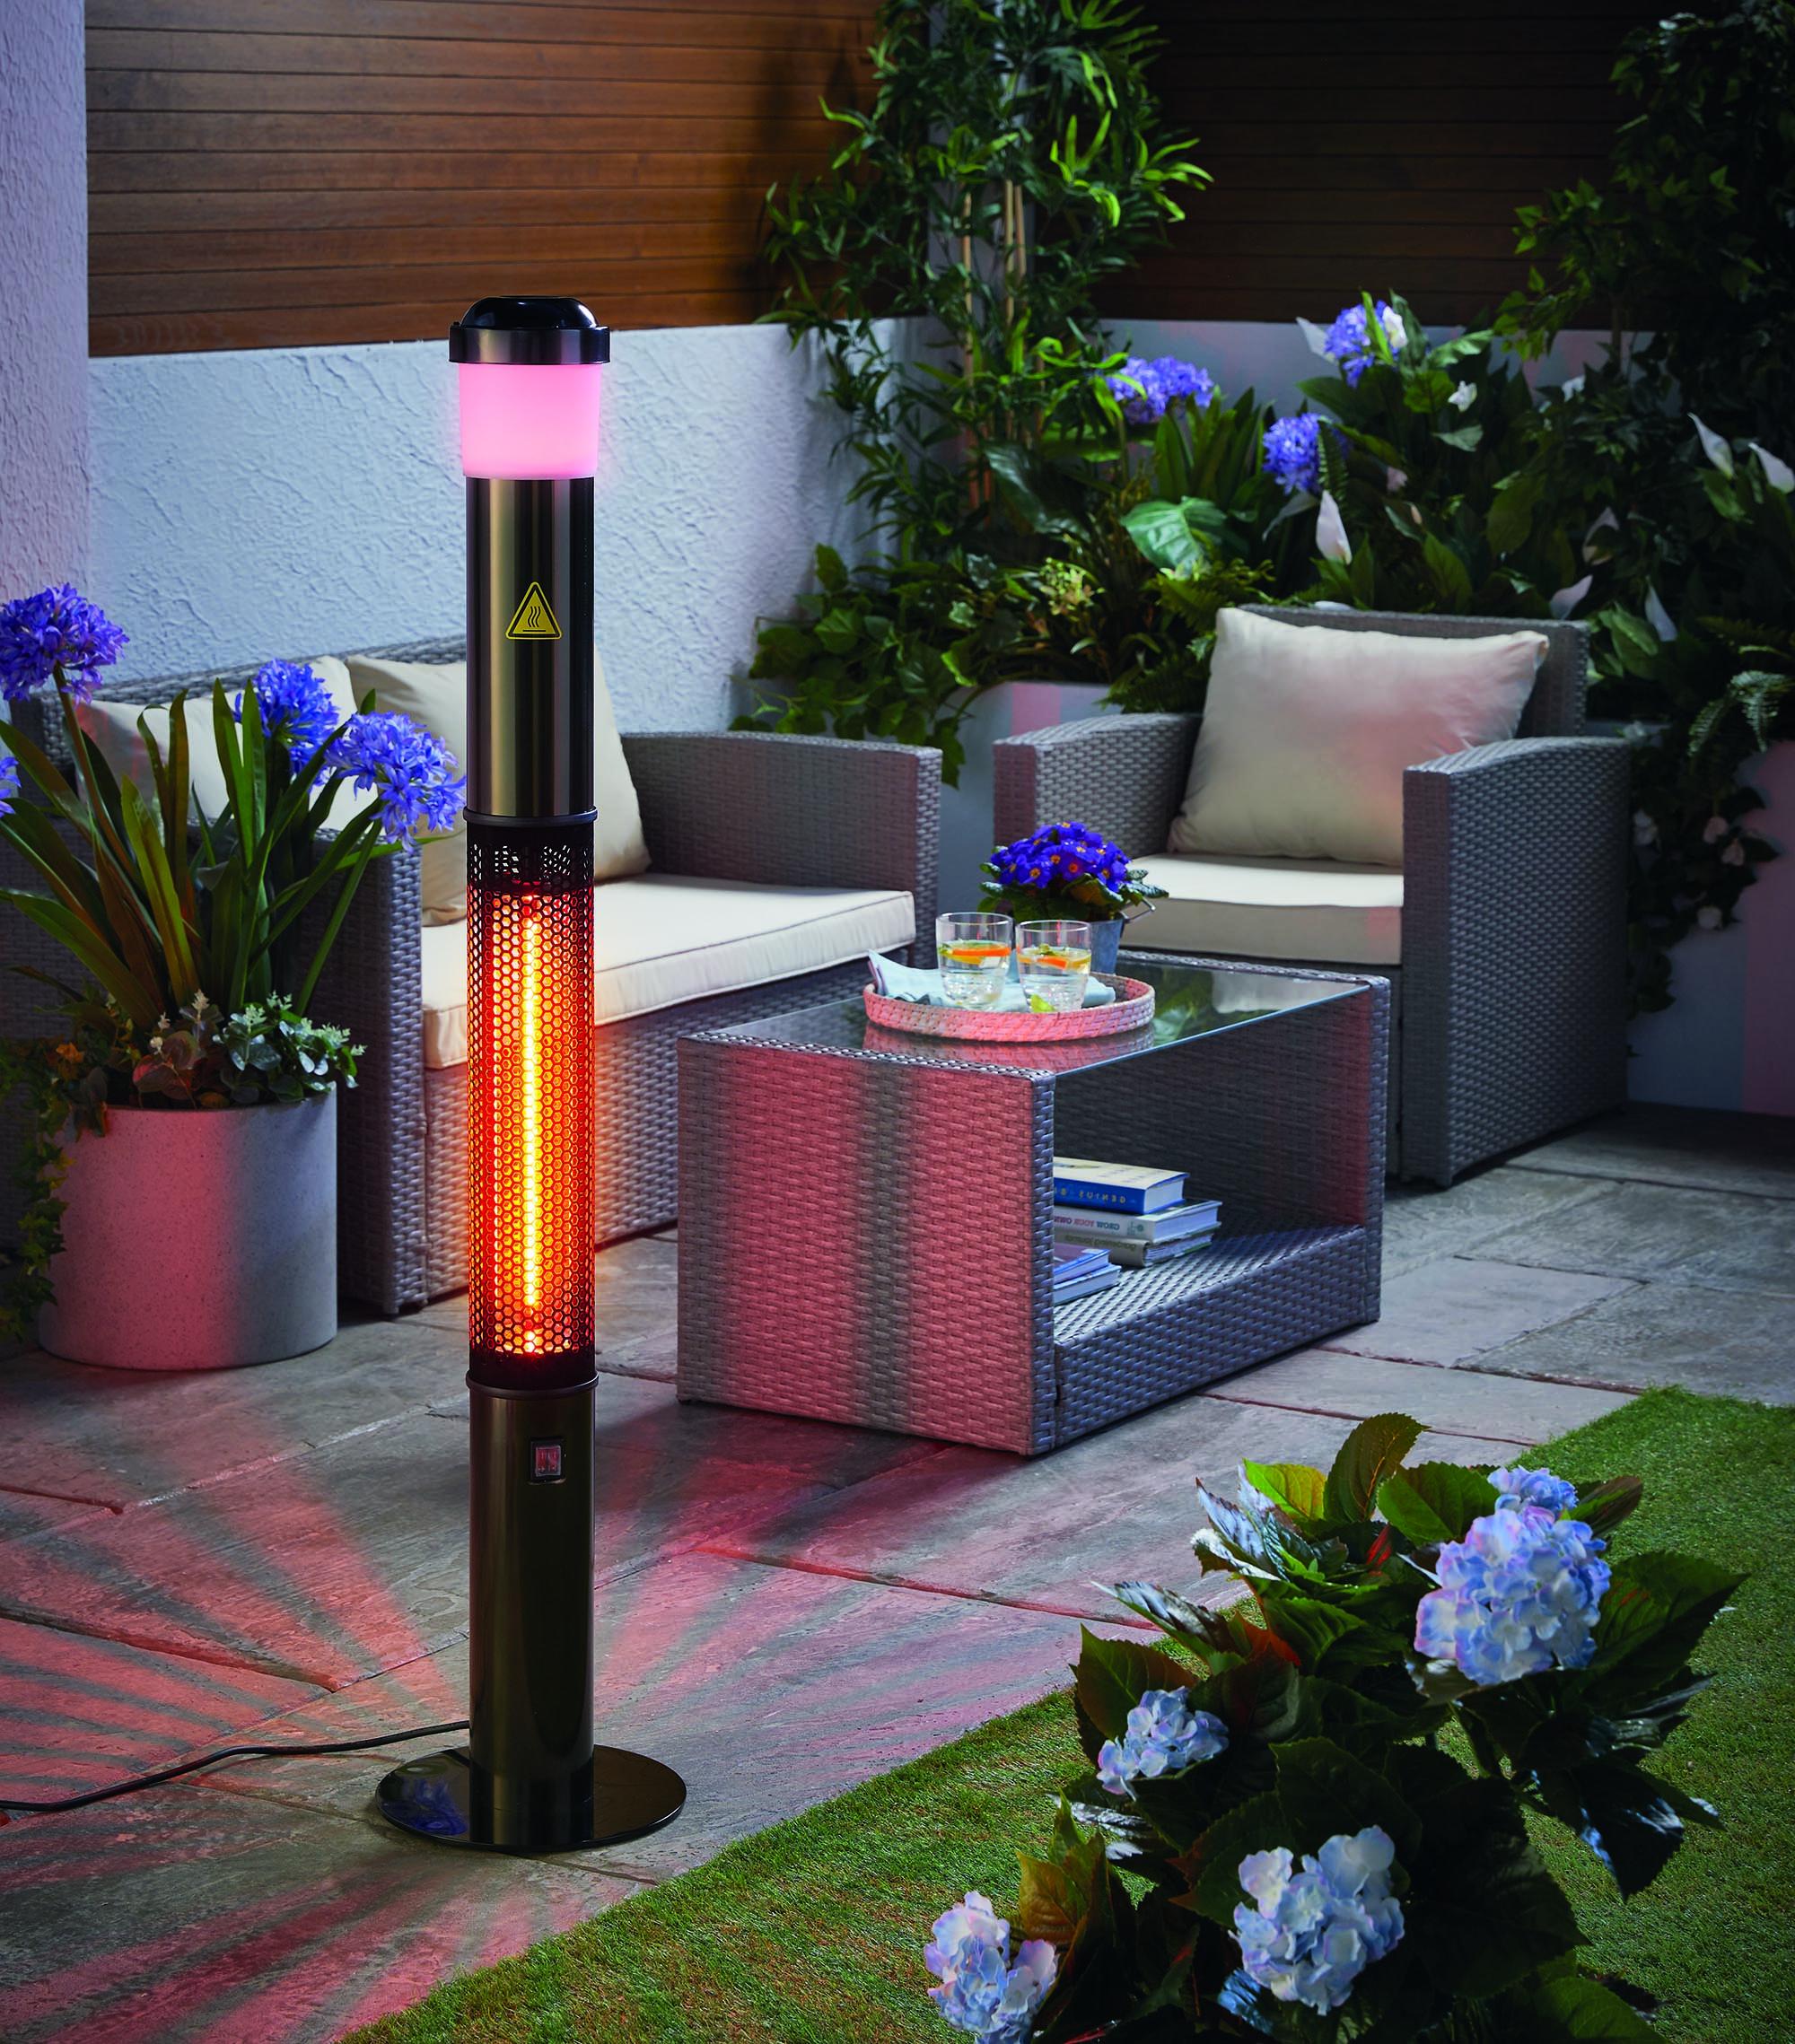 Aldi Specialbuys: Bluetooth patio heater